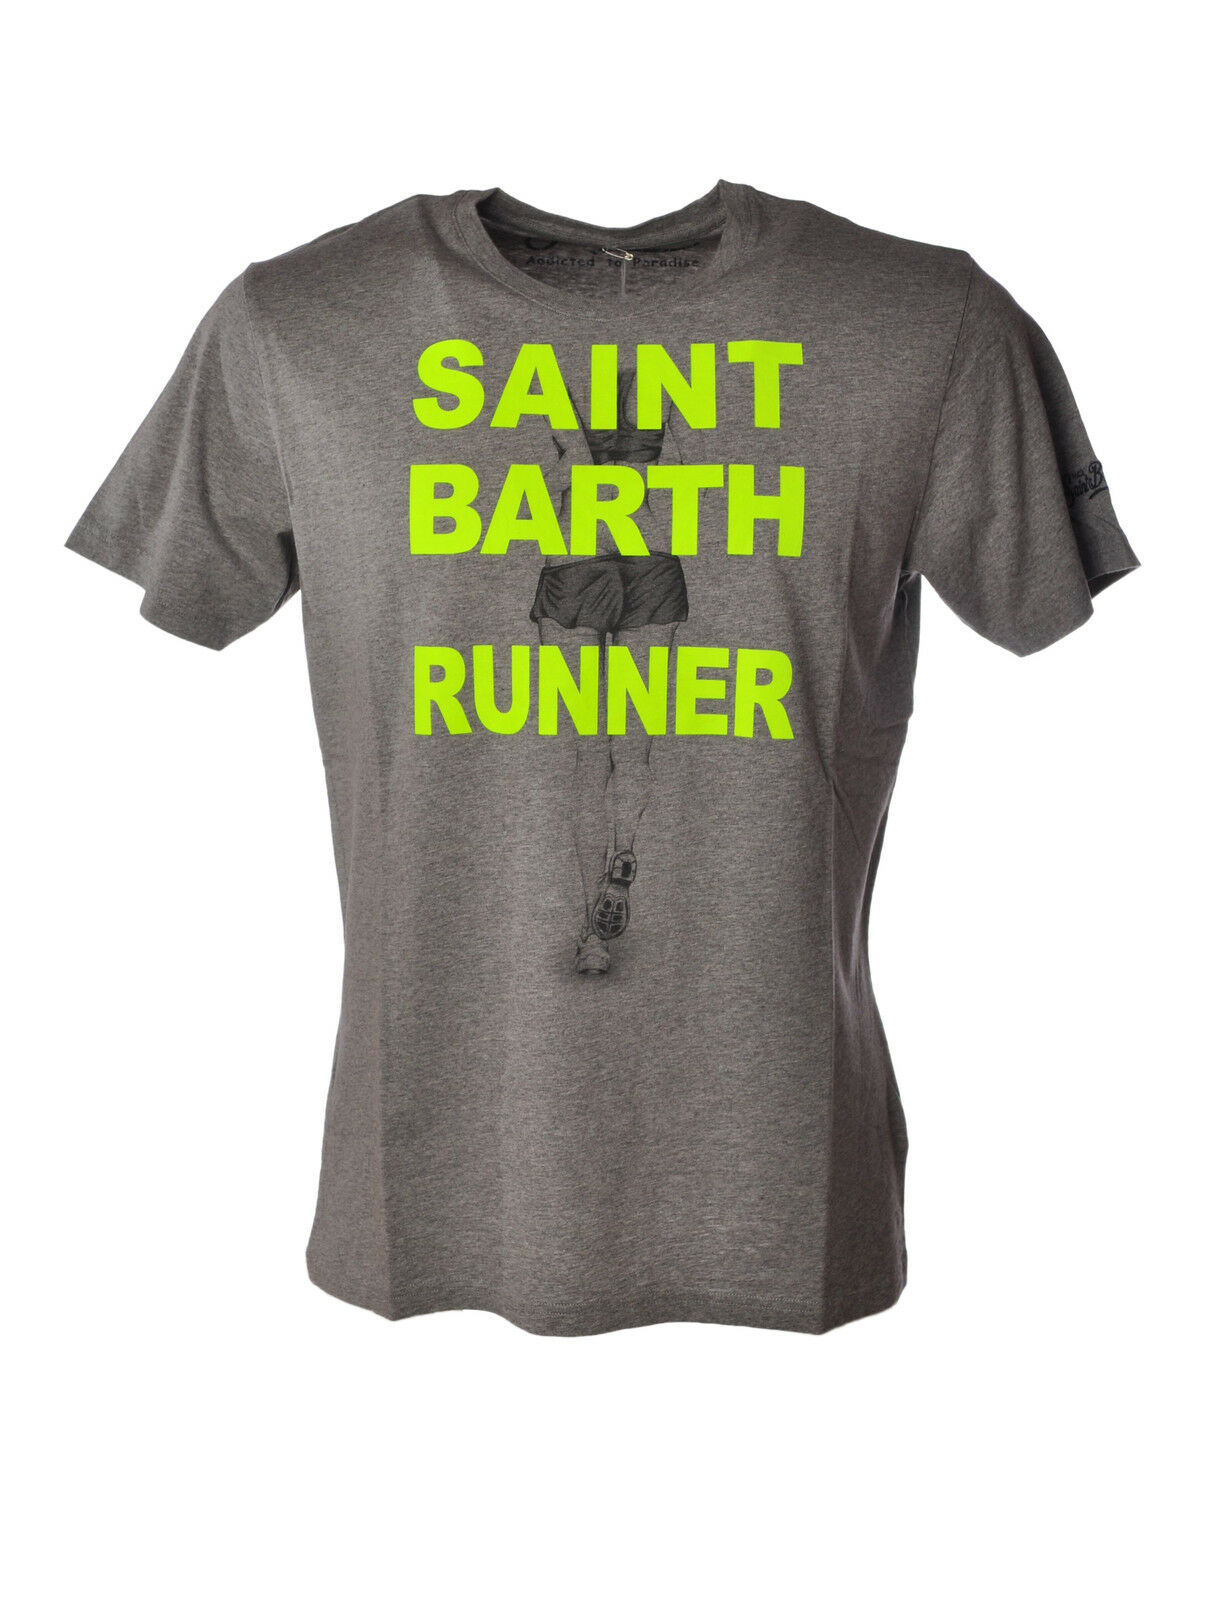 Saint Barth - Topwear-T-shirts - Man - Grau - 3497810C184155